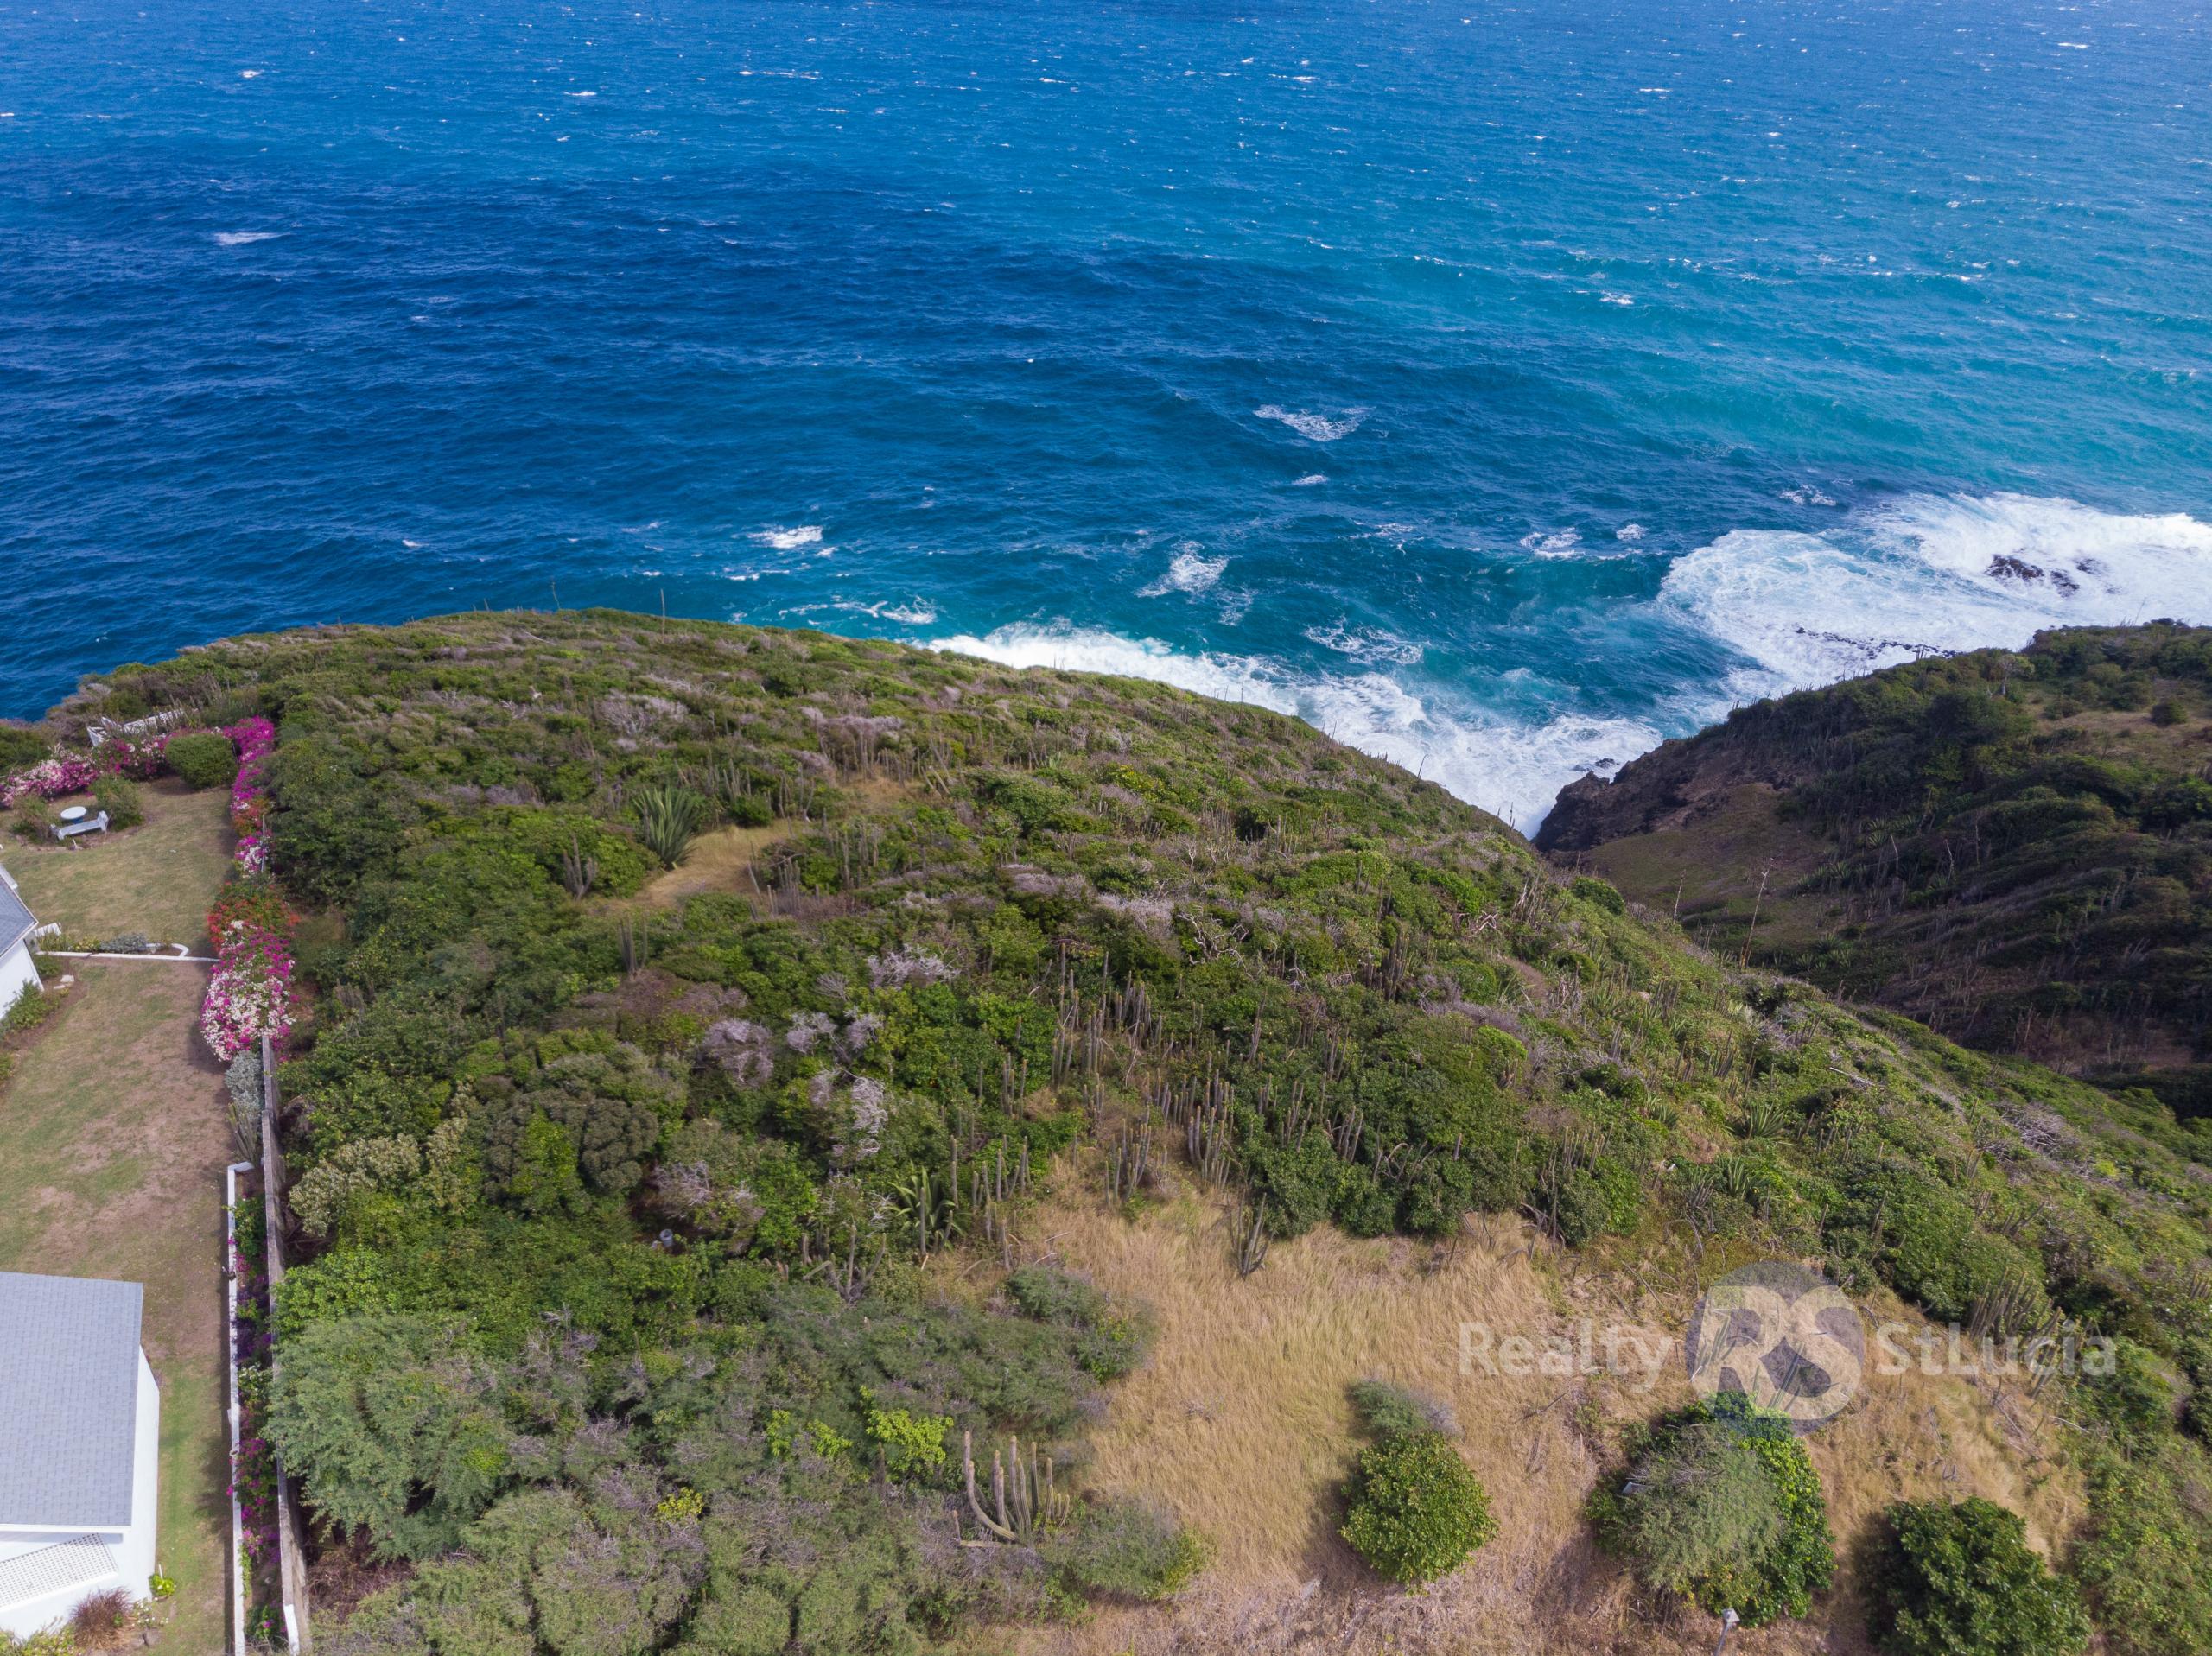 land for sale seabreeze hills cap estate St Lucica